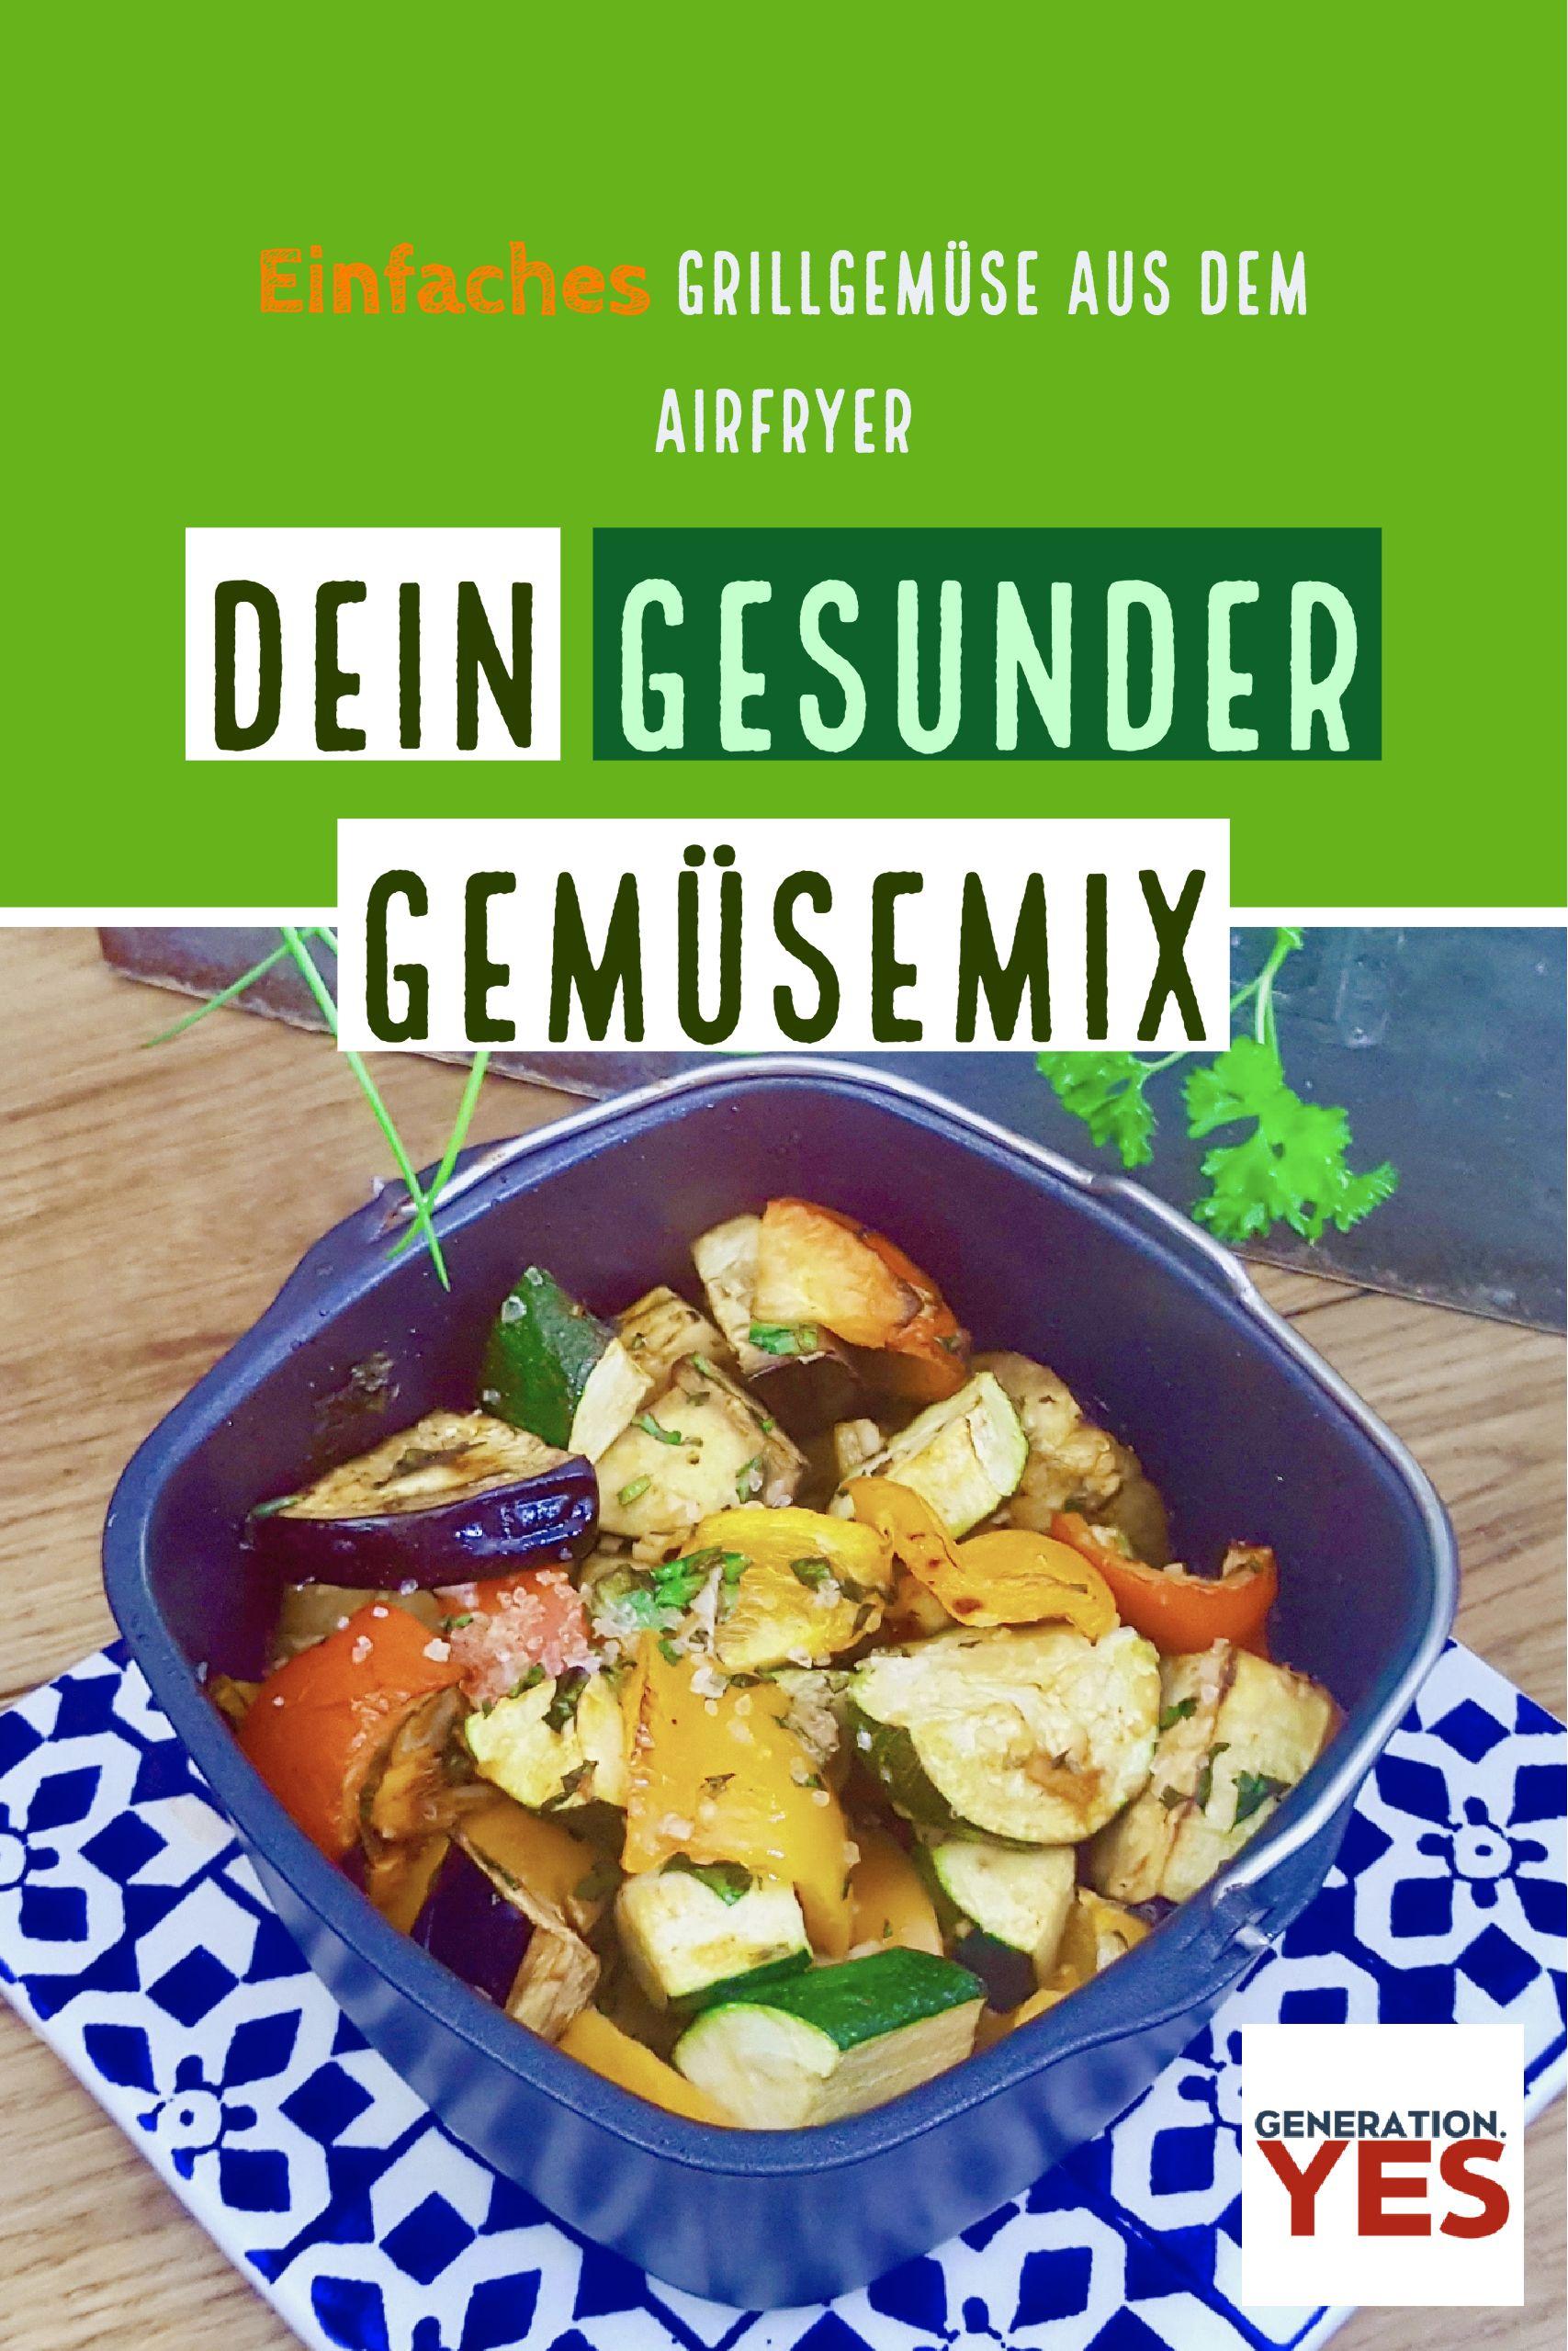 Gesunder Gemüsemix mit Pfiff | Mediterranes gemüse, Kalorienarmes ...